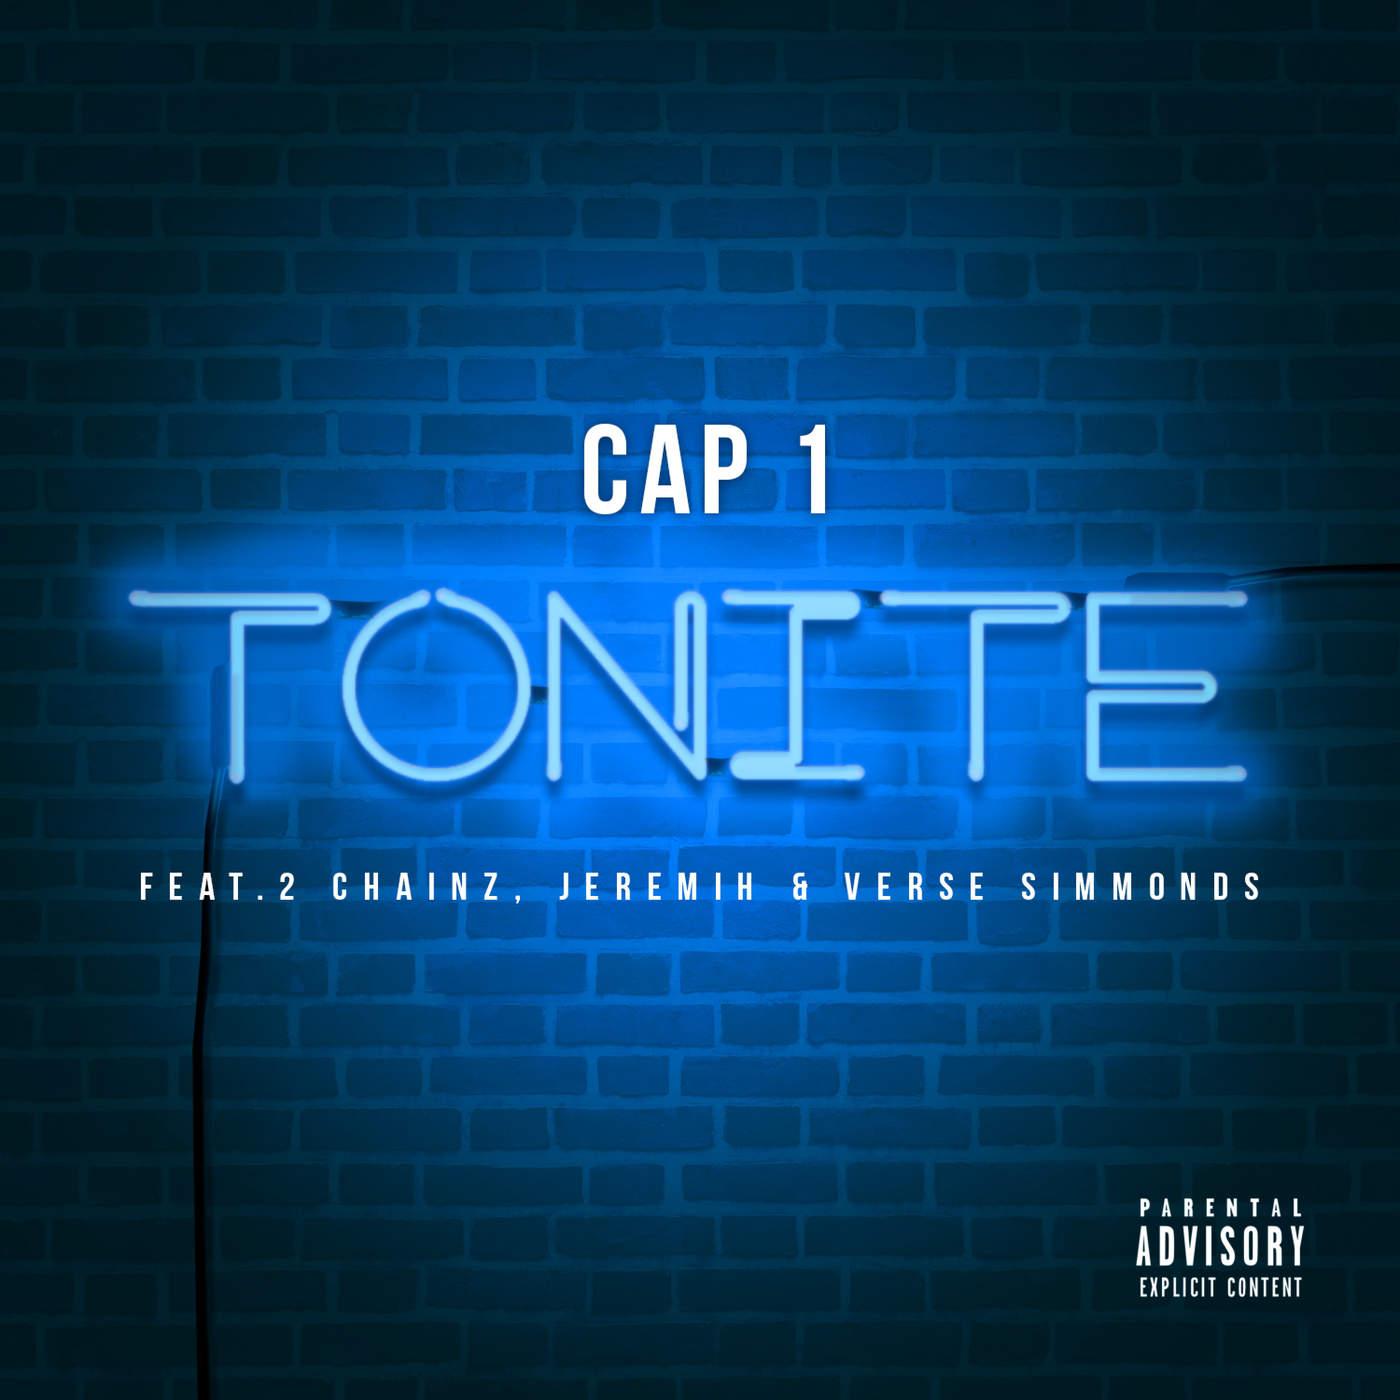 Cap 1 - Tonite (feat. 2 Chainz, Jeremih & Verse Simmonds) - Single Cover